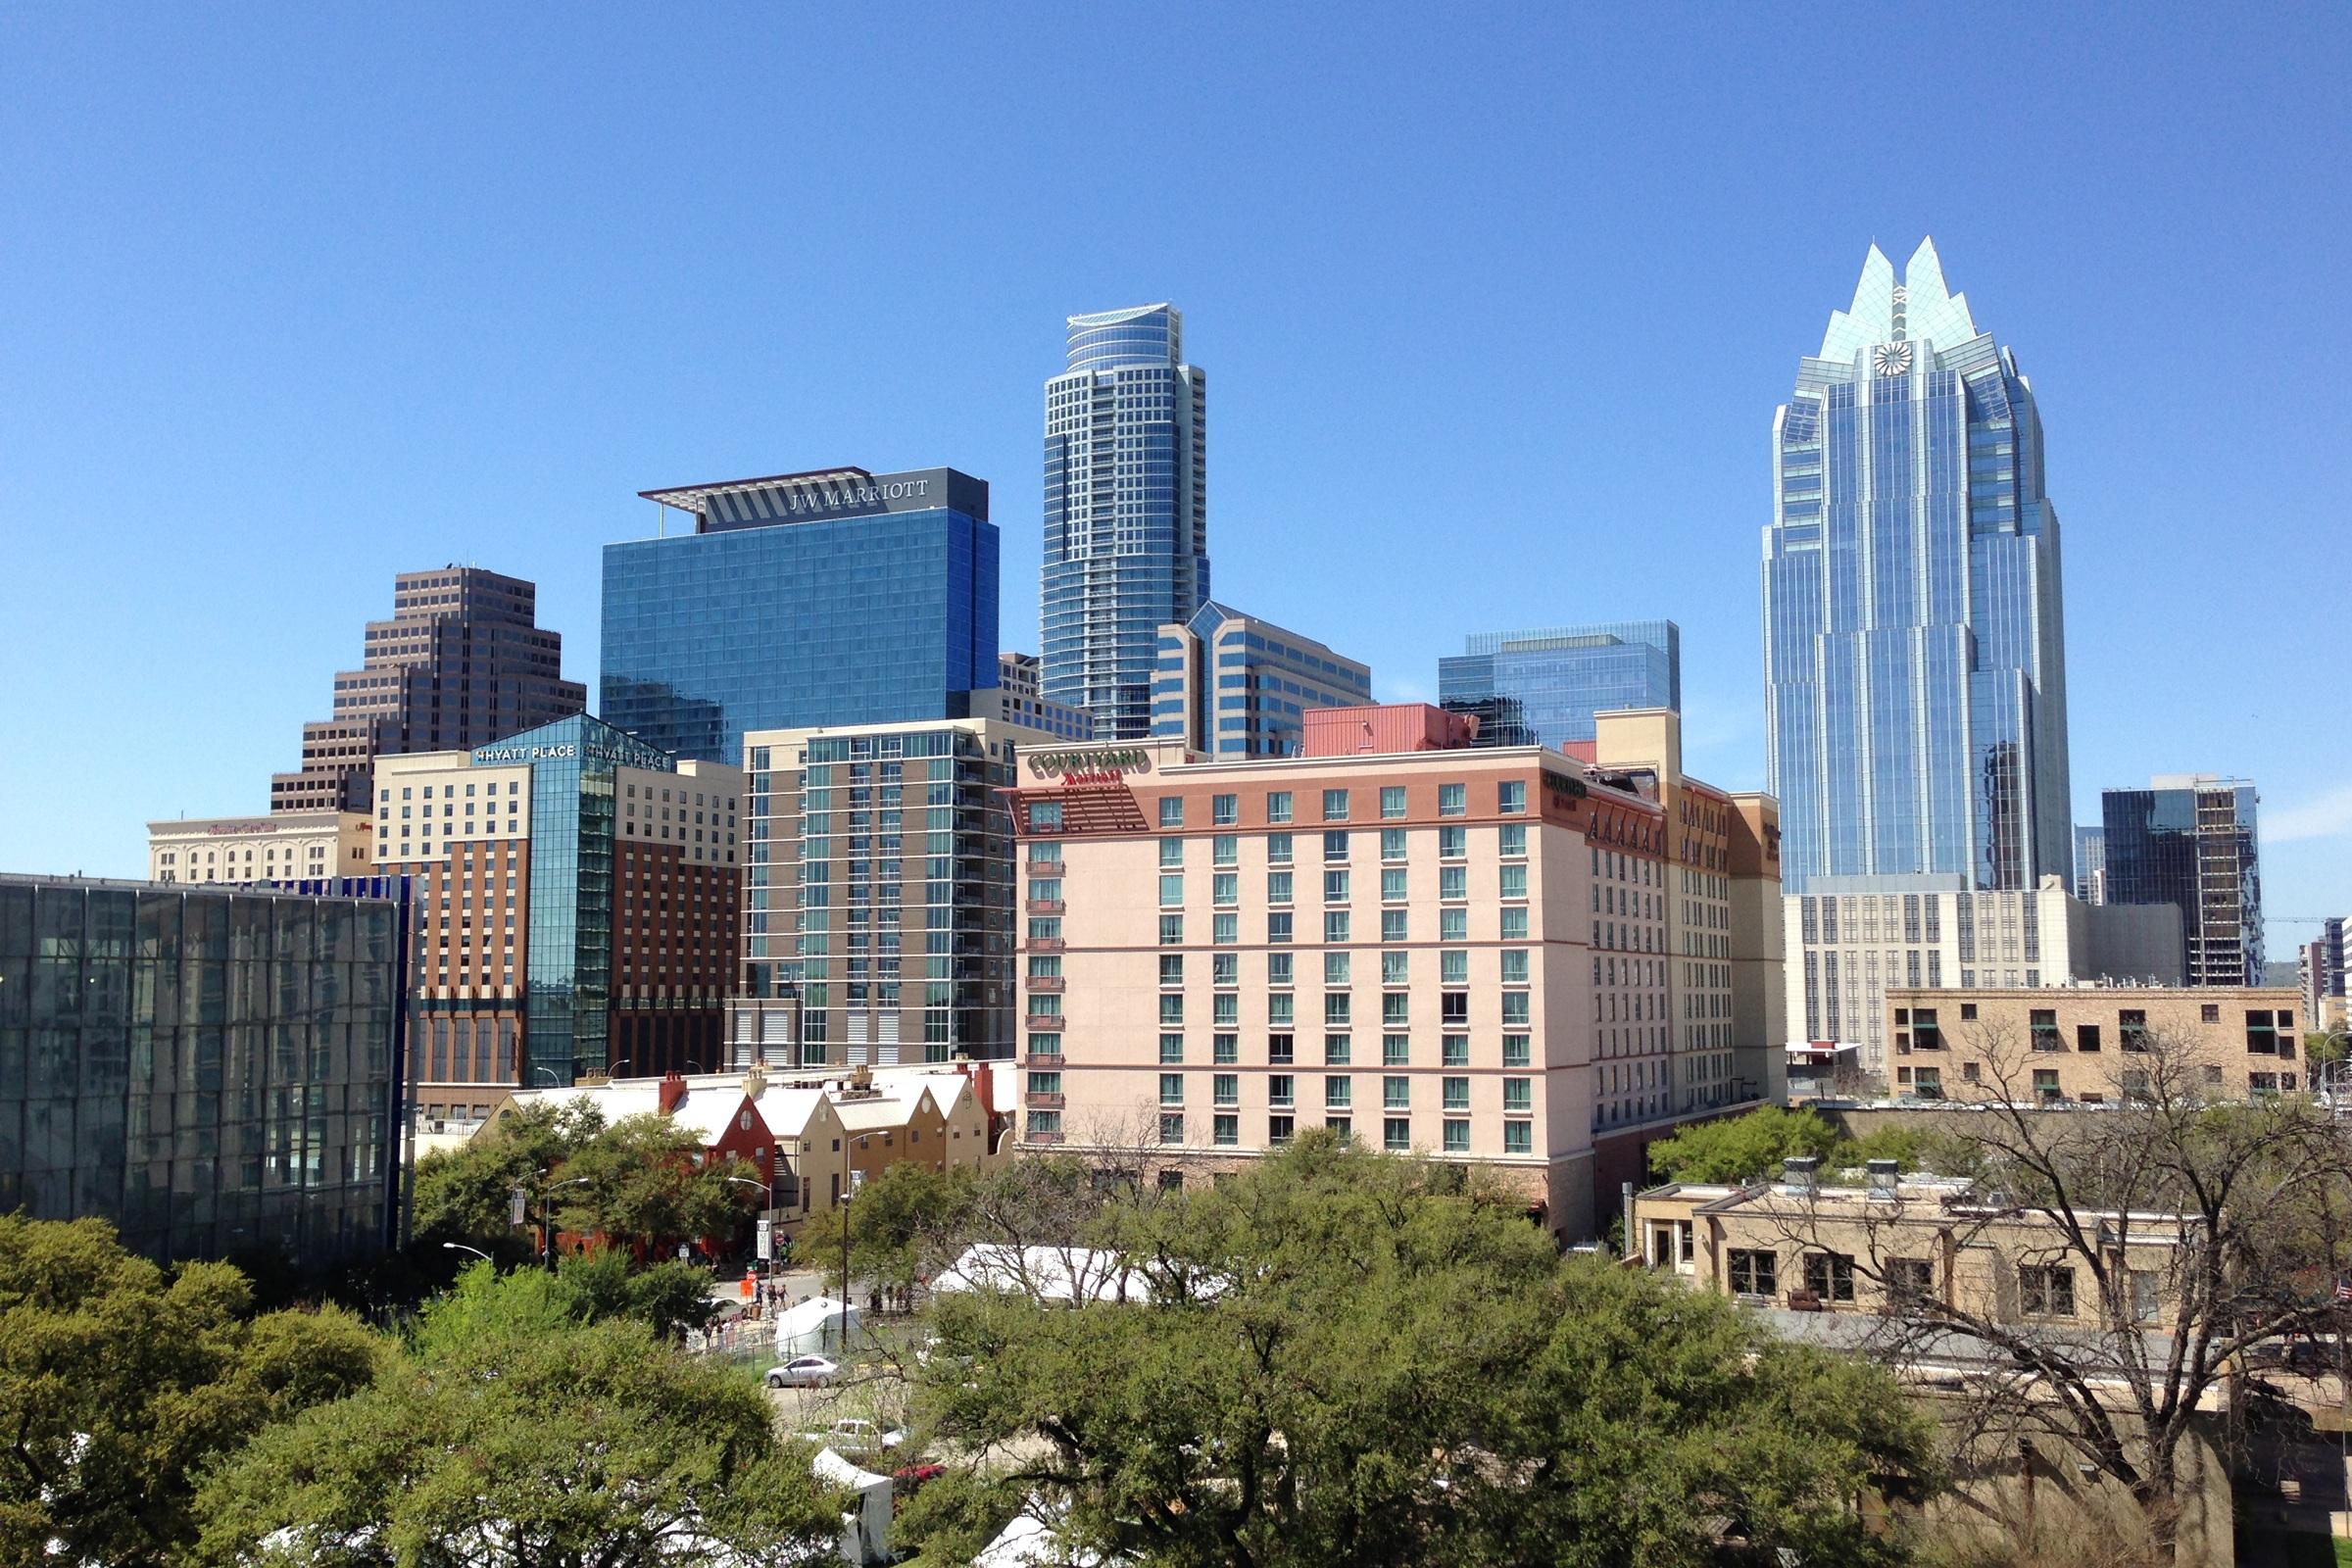 A photo of Austin's skyline.